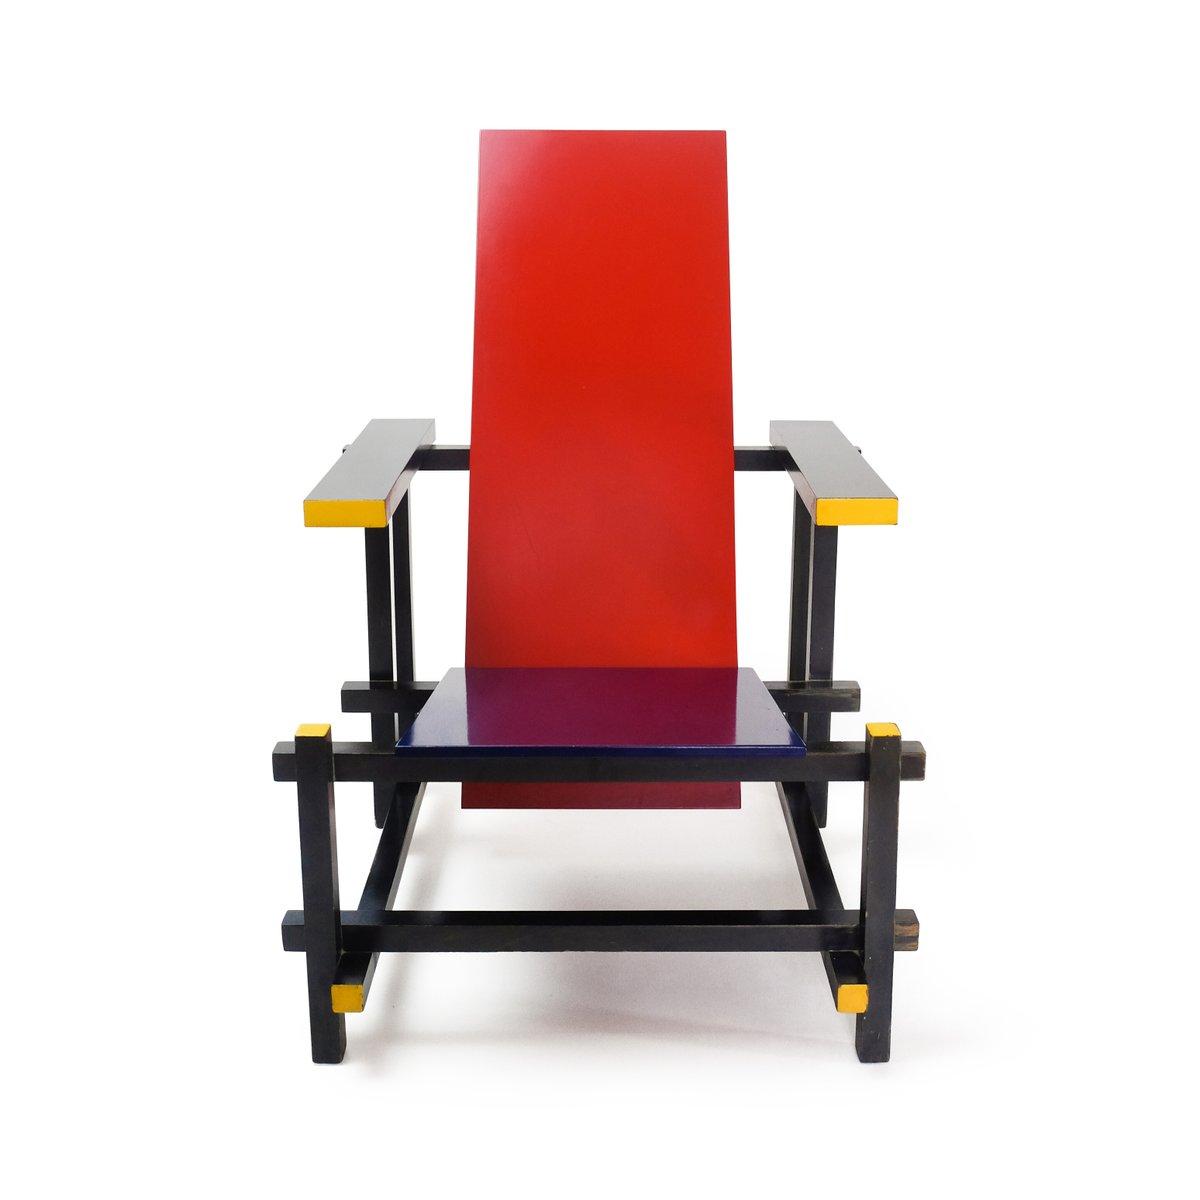 Rietveld Stuhl blue chair by gerrit rietveld for cassina 1970s for